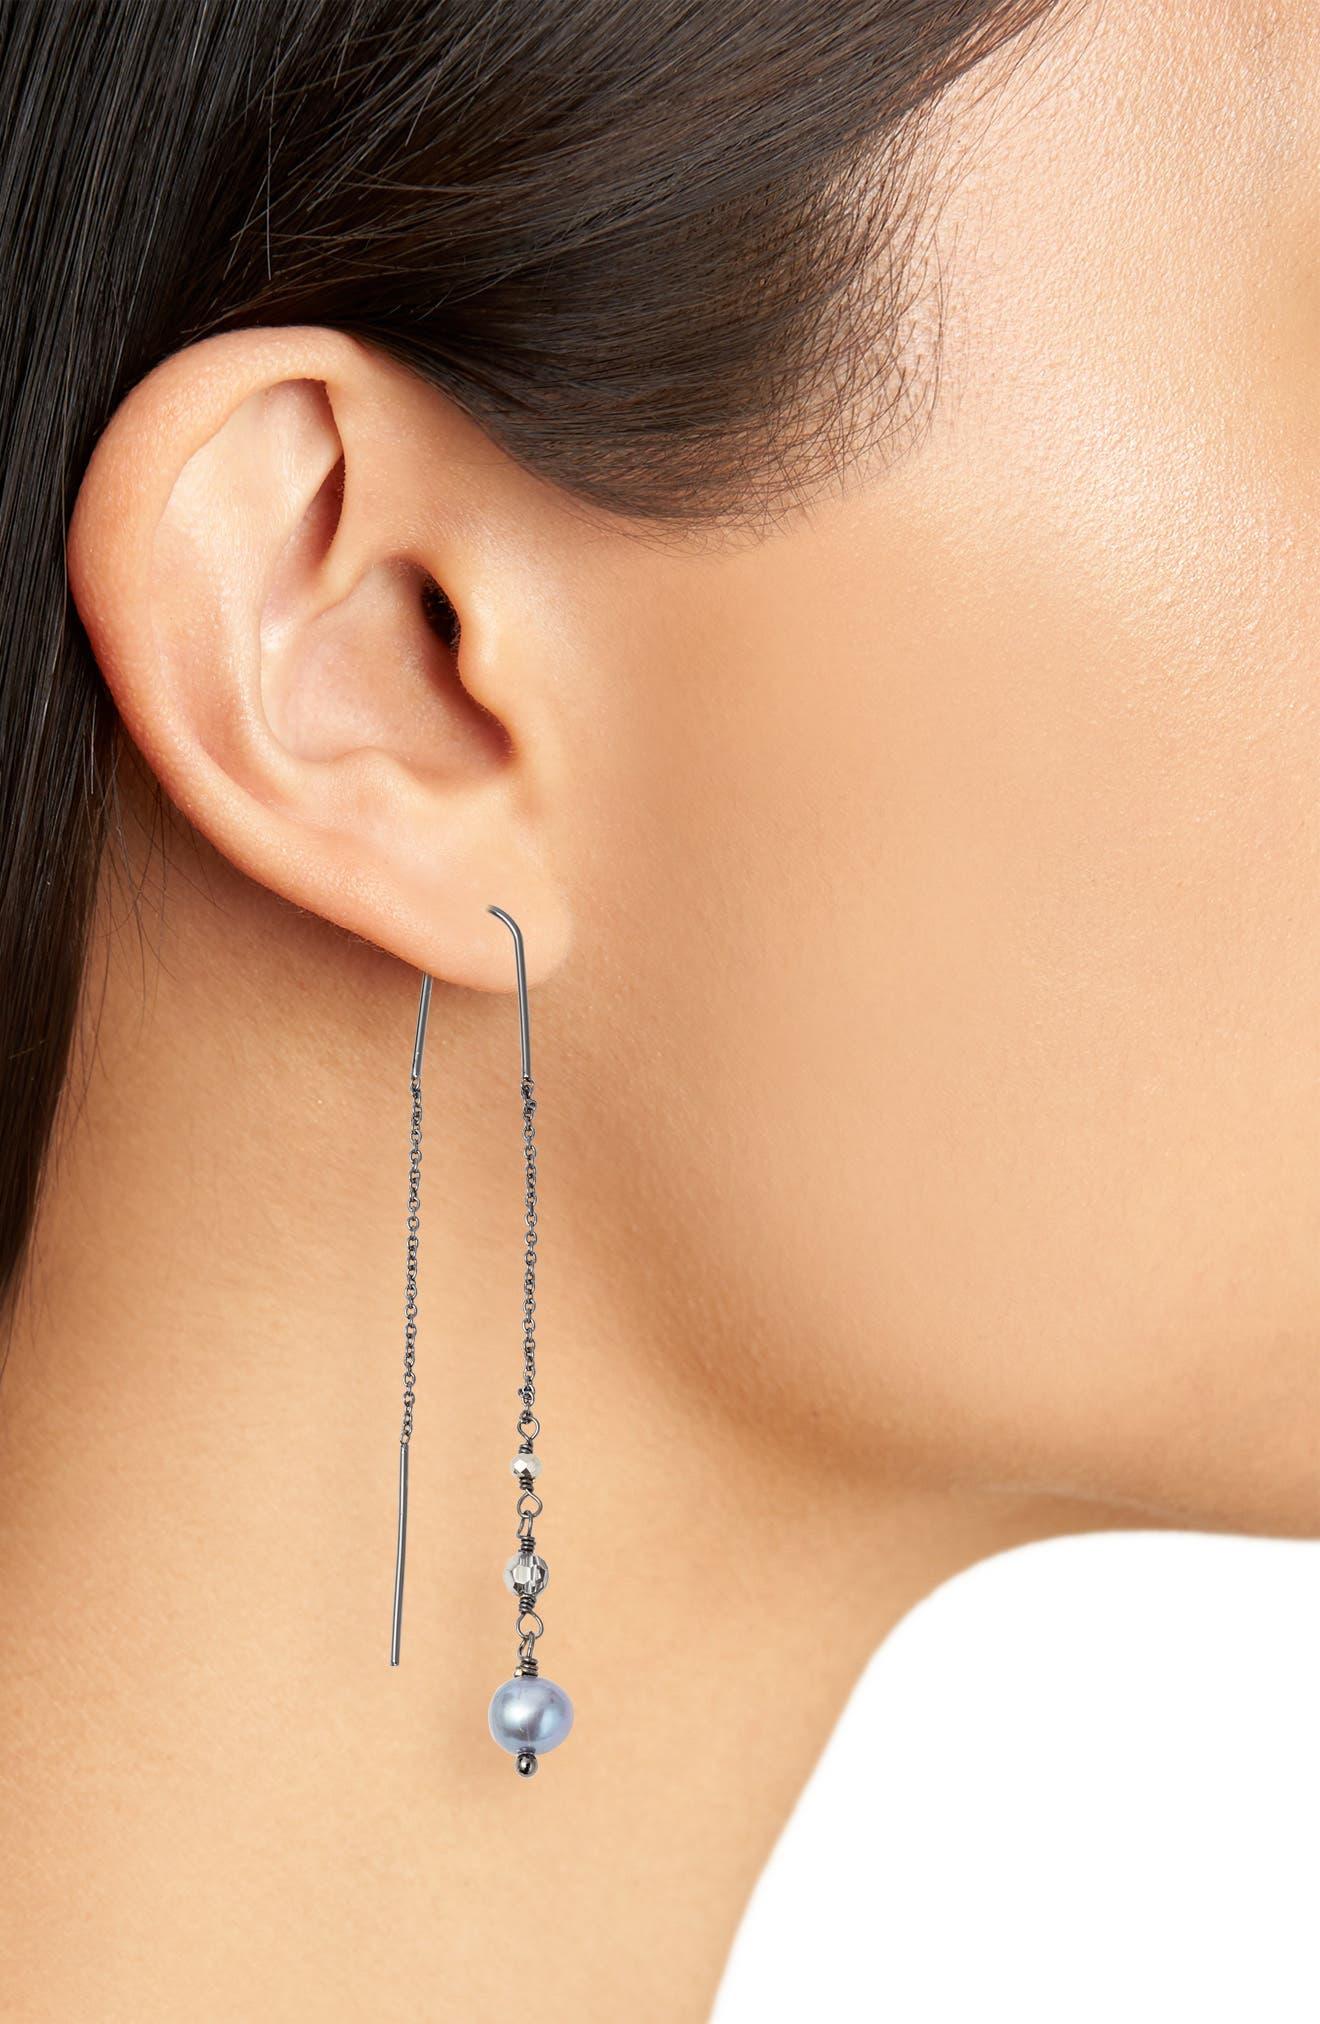 Katie Pearl Threader Earrings,                             Alternate thumbnail 2, color,                             040